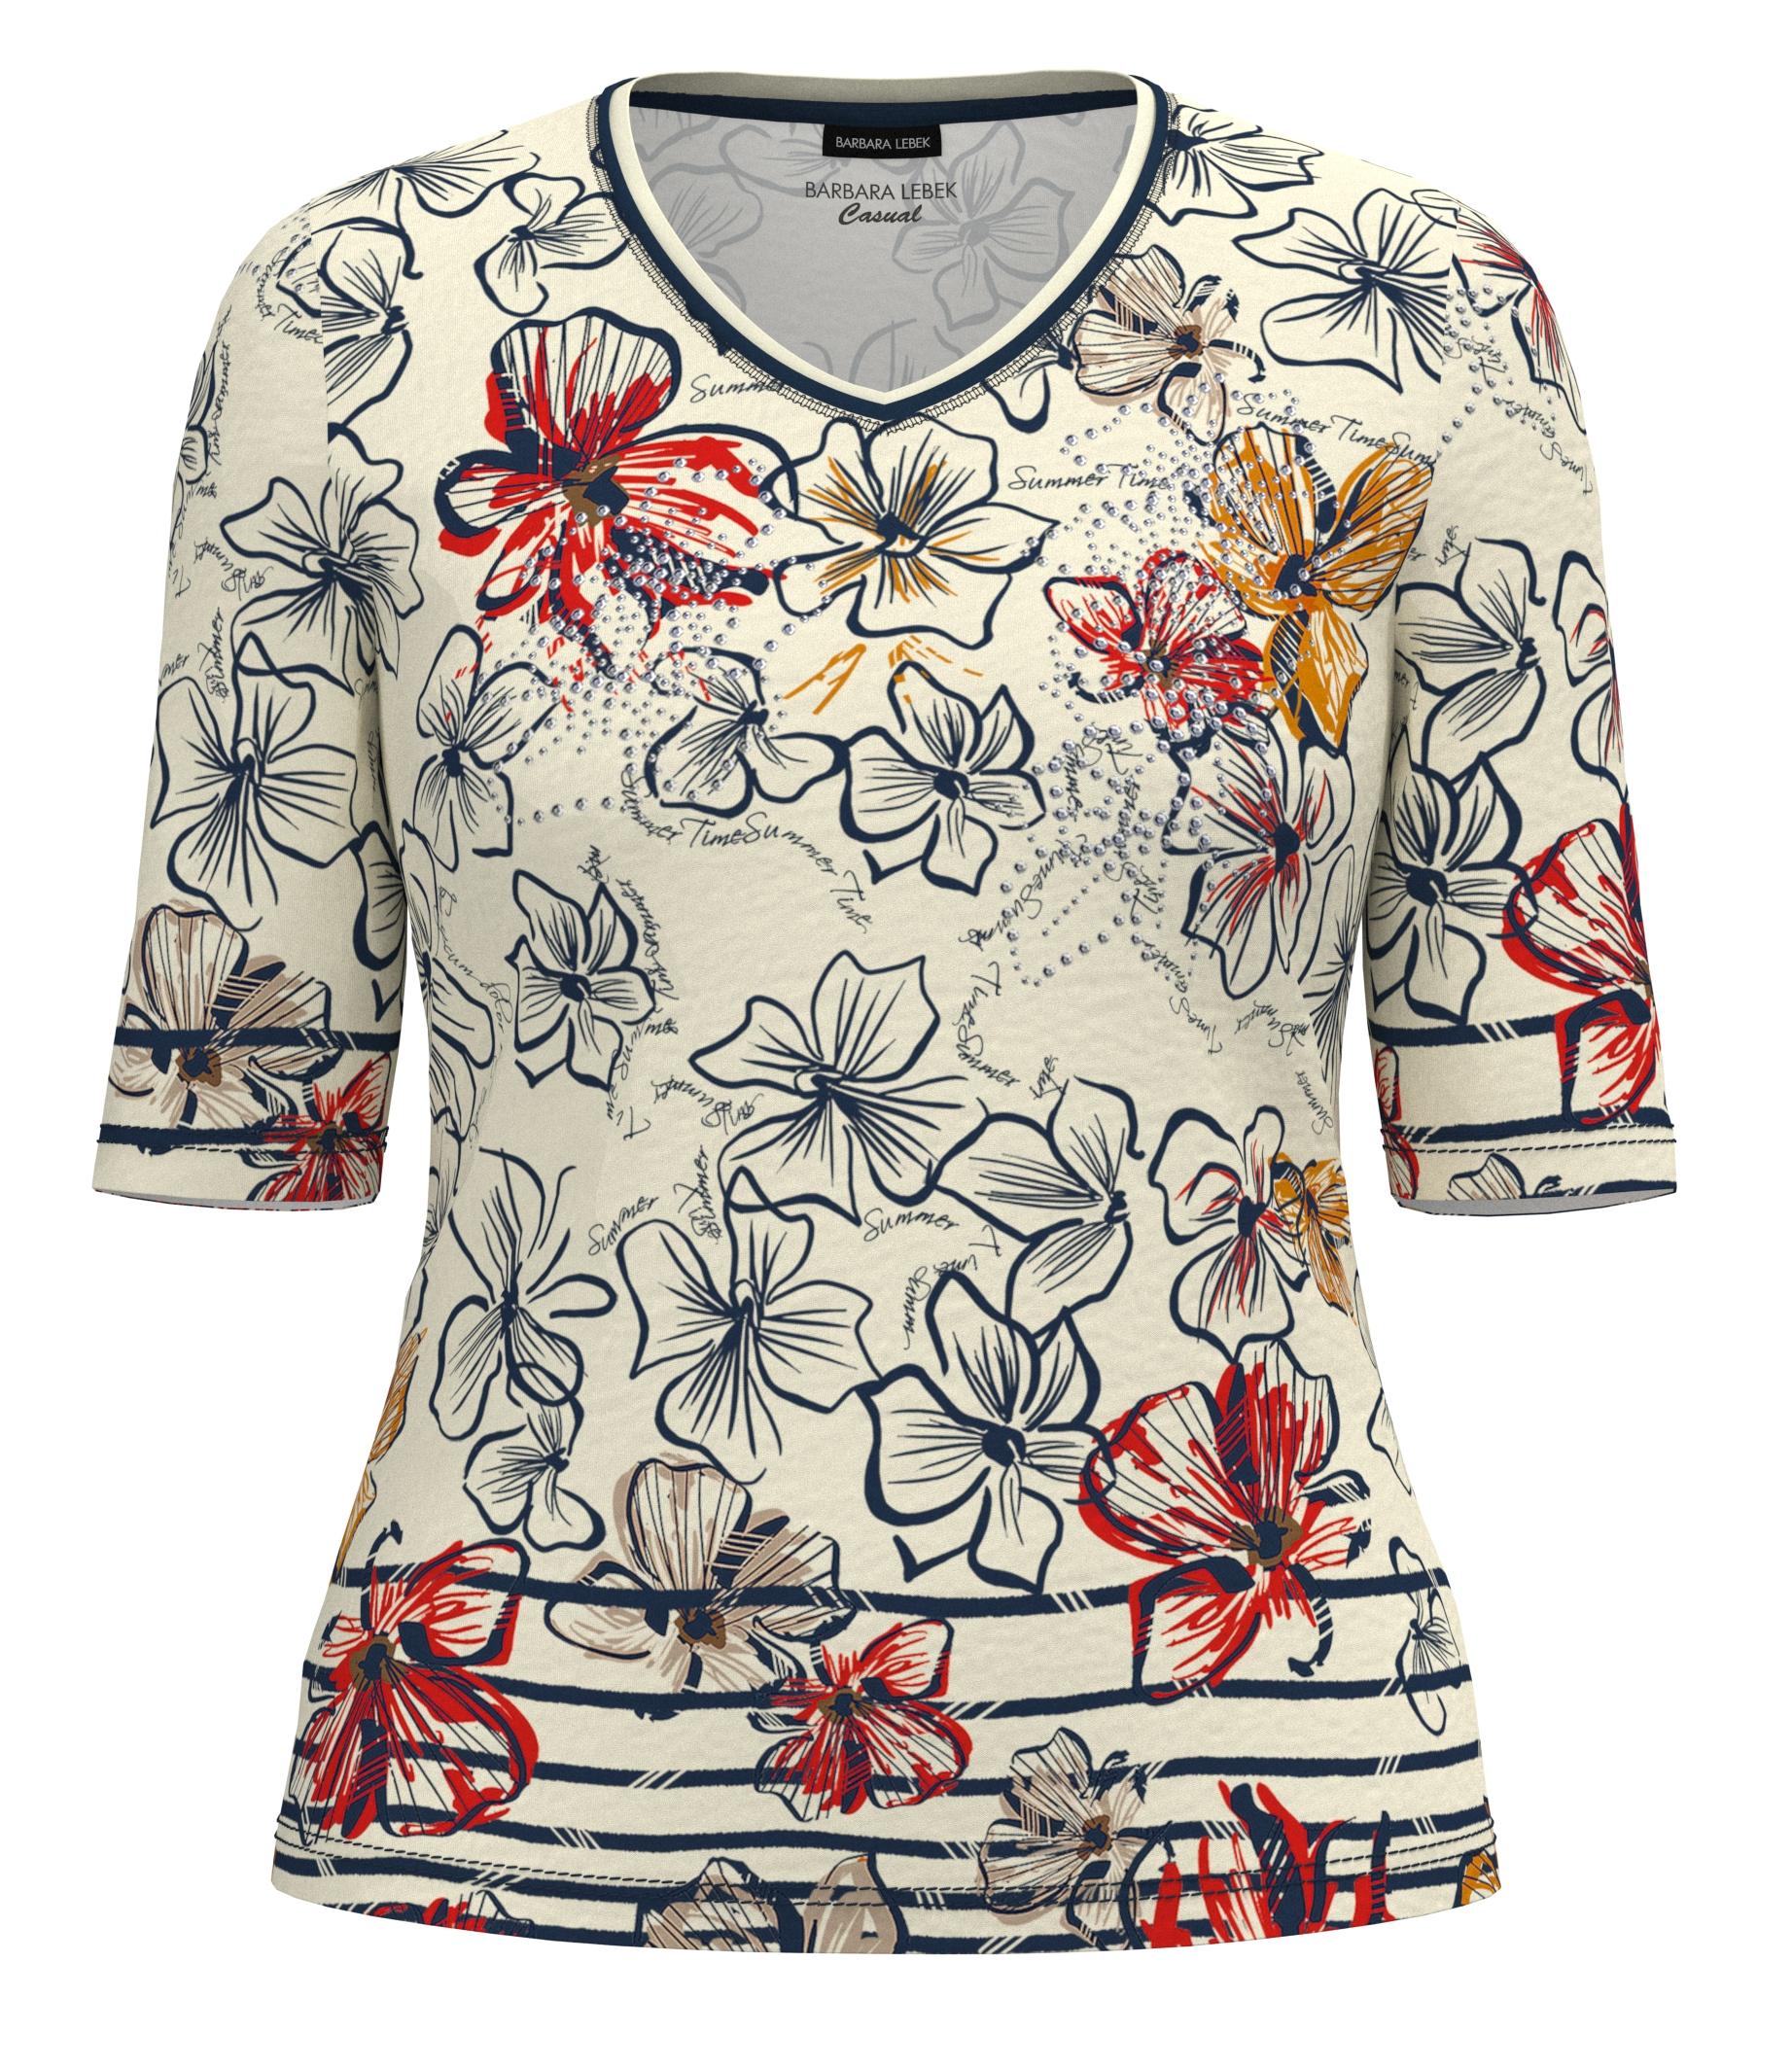 Barbara Lebek 7/8 Arm Shirt floral gemustert weiß